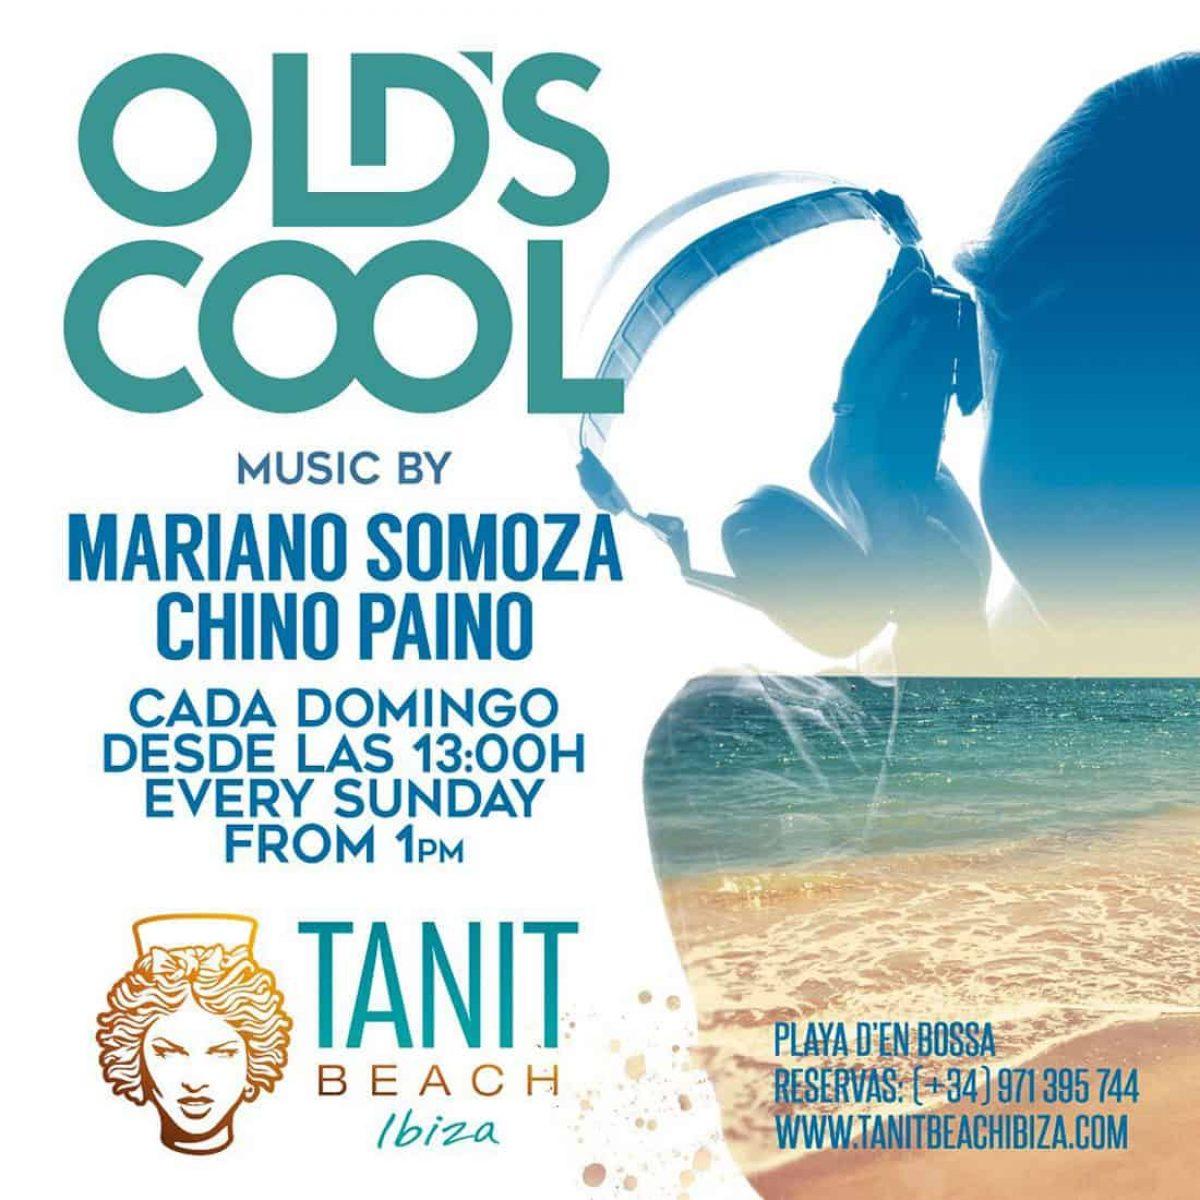 old-s-cool-tanit-beach-ibiza-2021-welcometoibiza